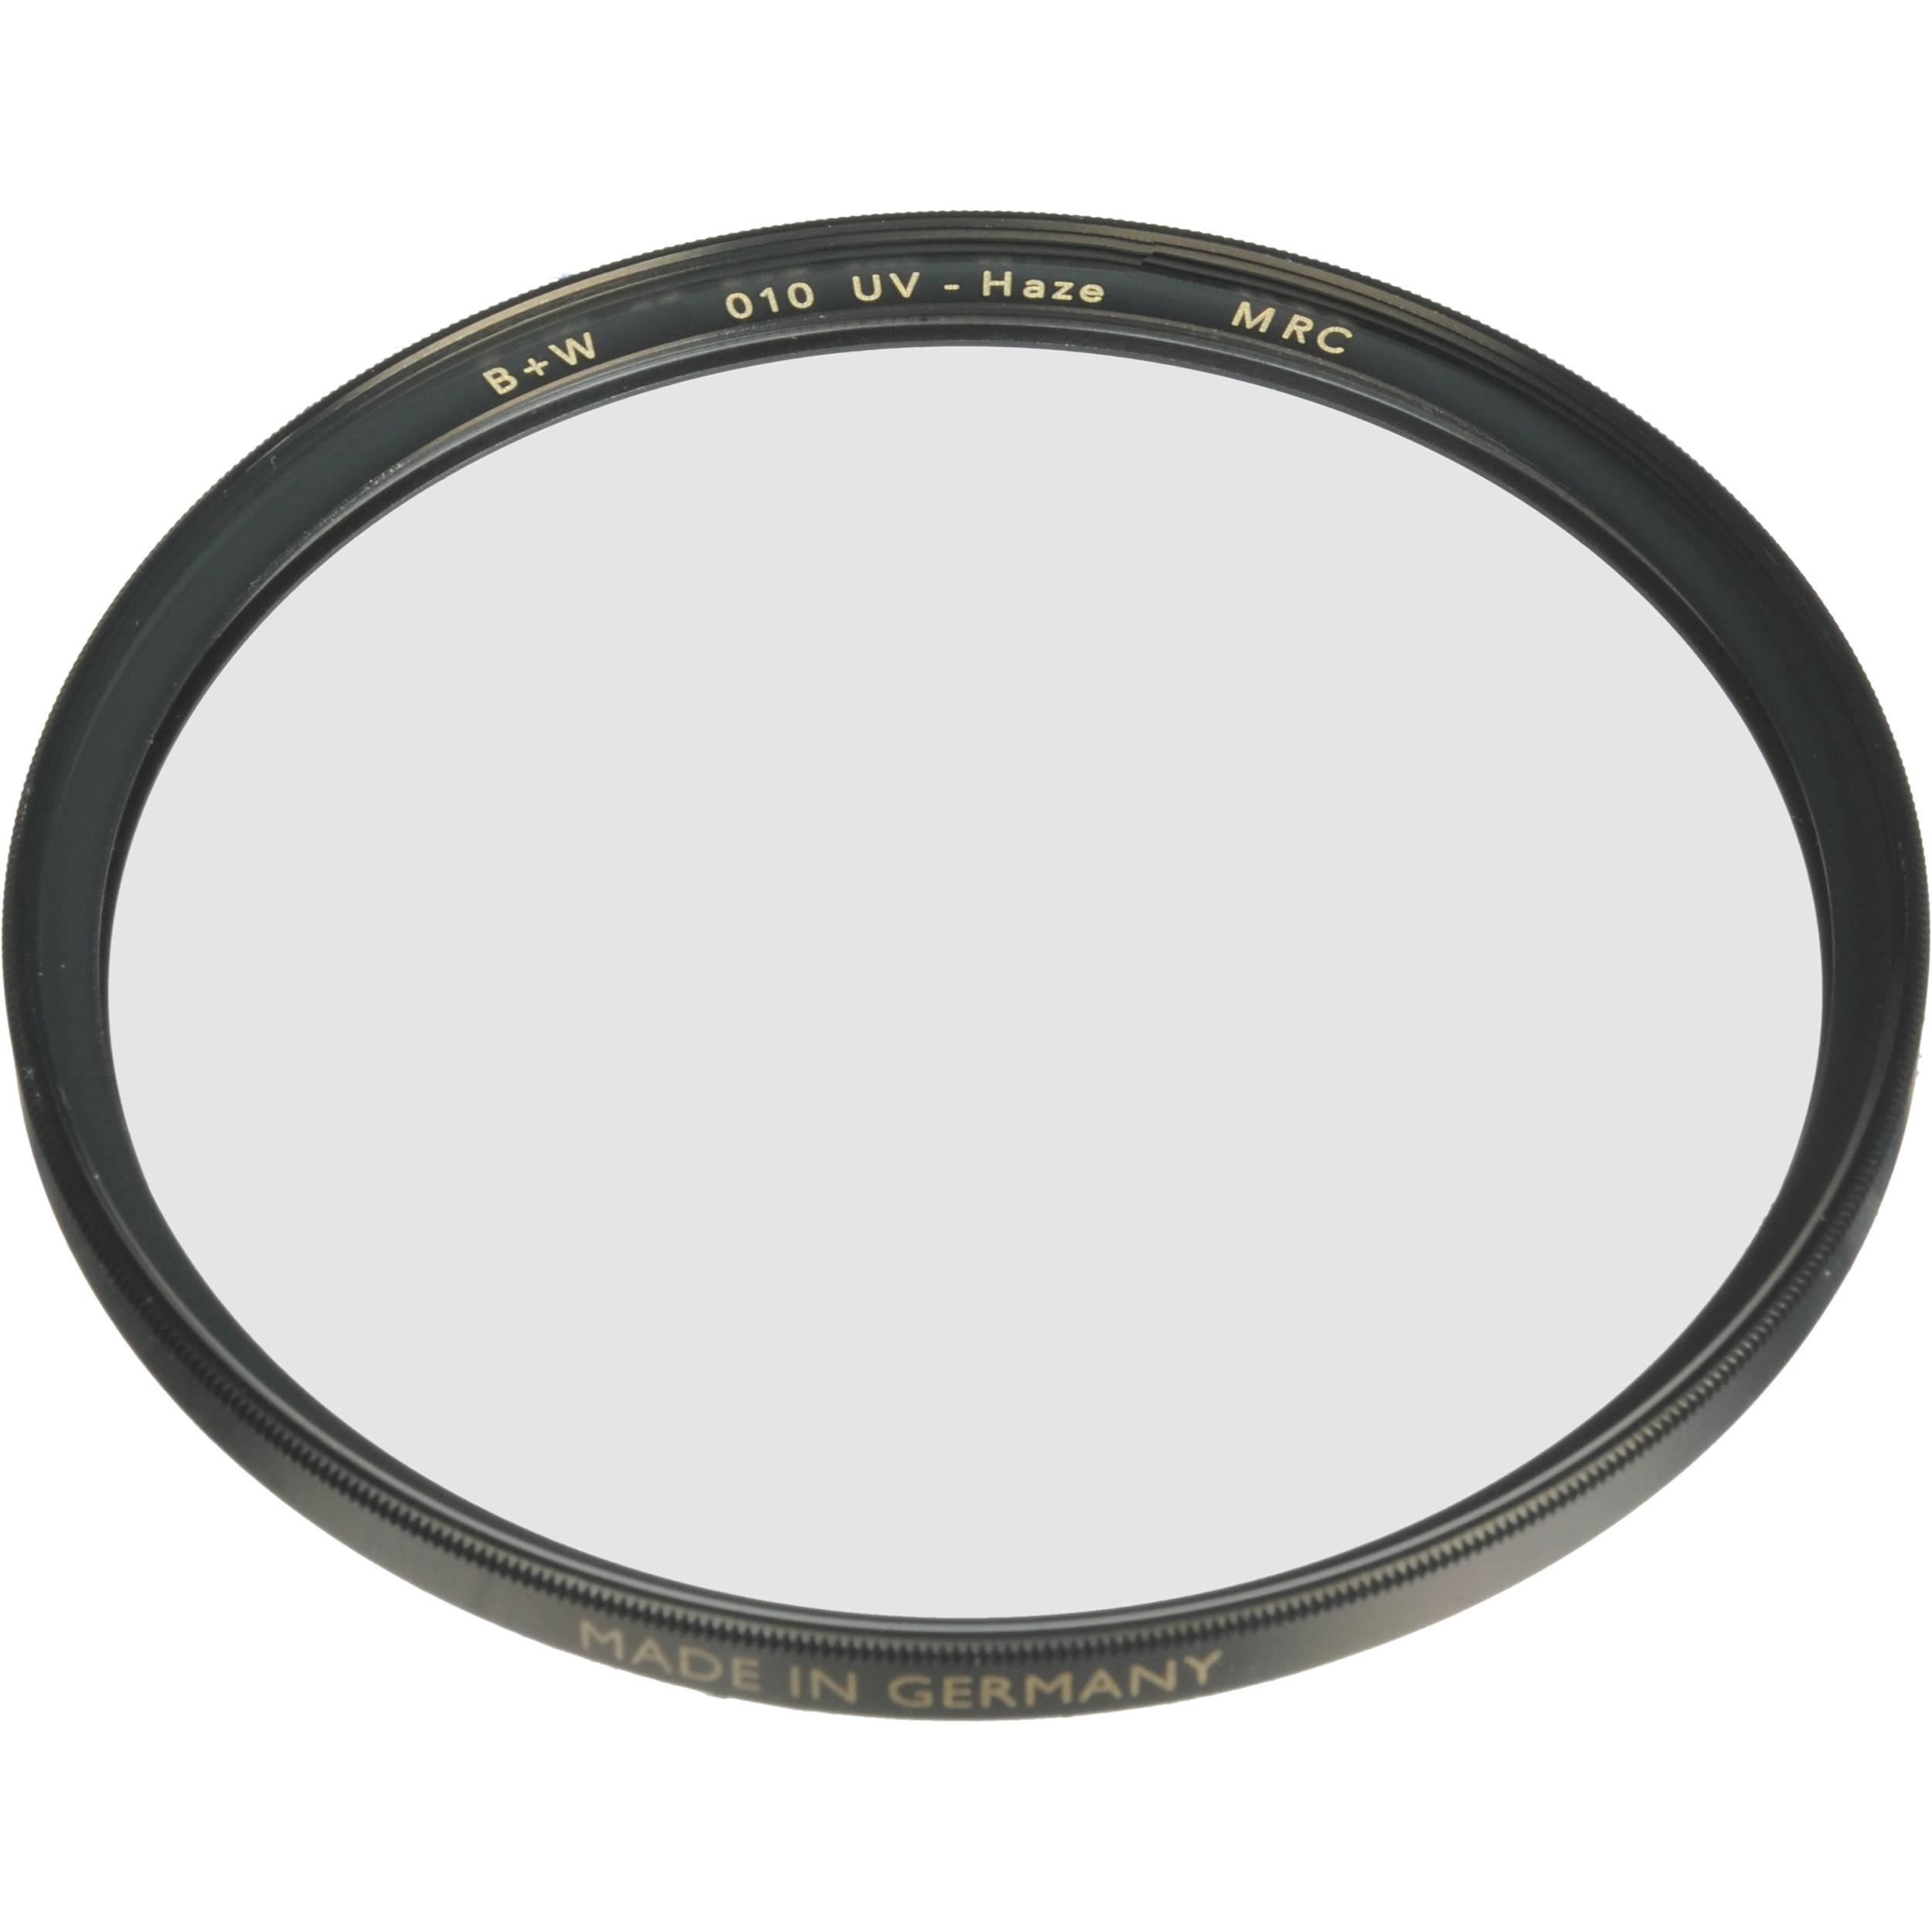 Multithreaded Glass Filter UV 86mm 1A Multicoated for Pentax K-200D Haze